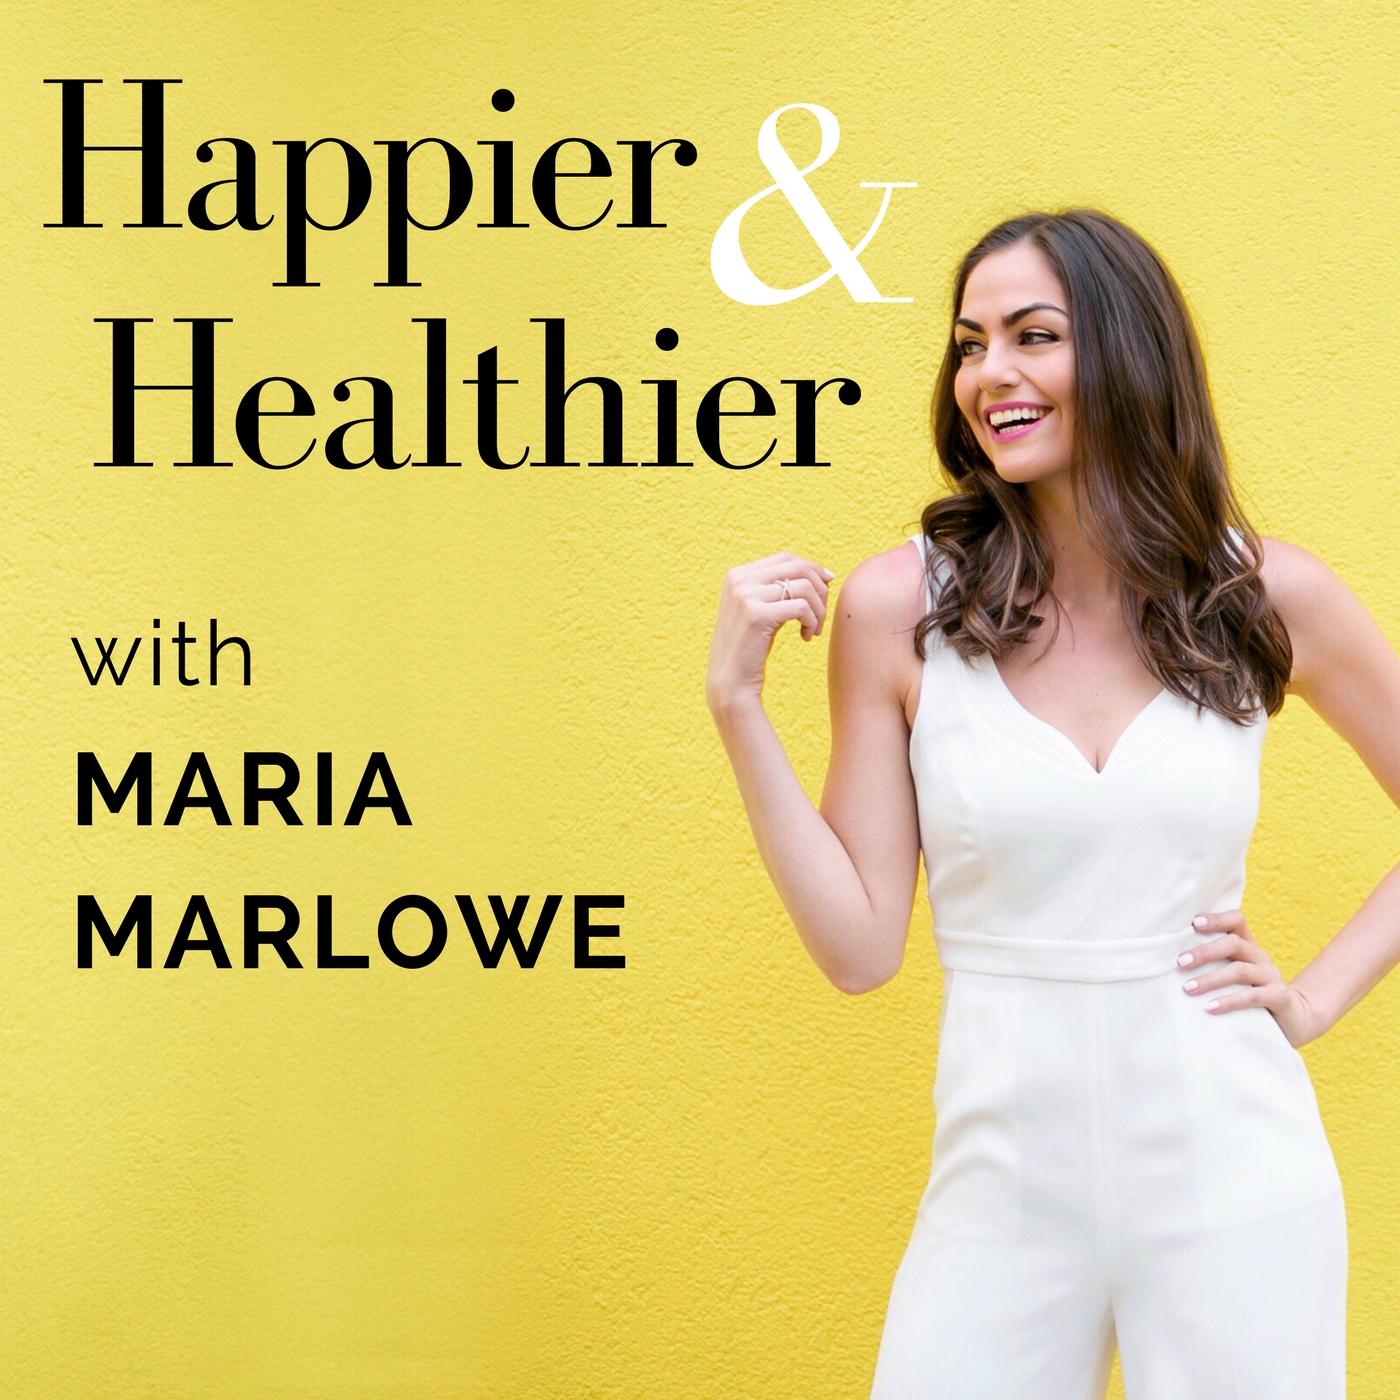 Happier & Healthier with Maria Marlowe show art